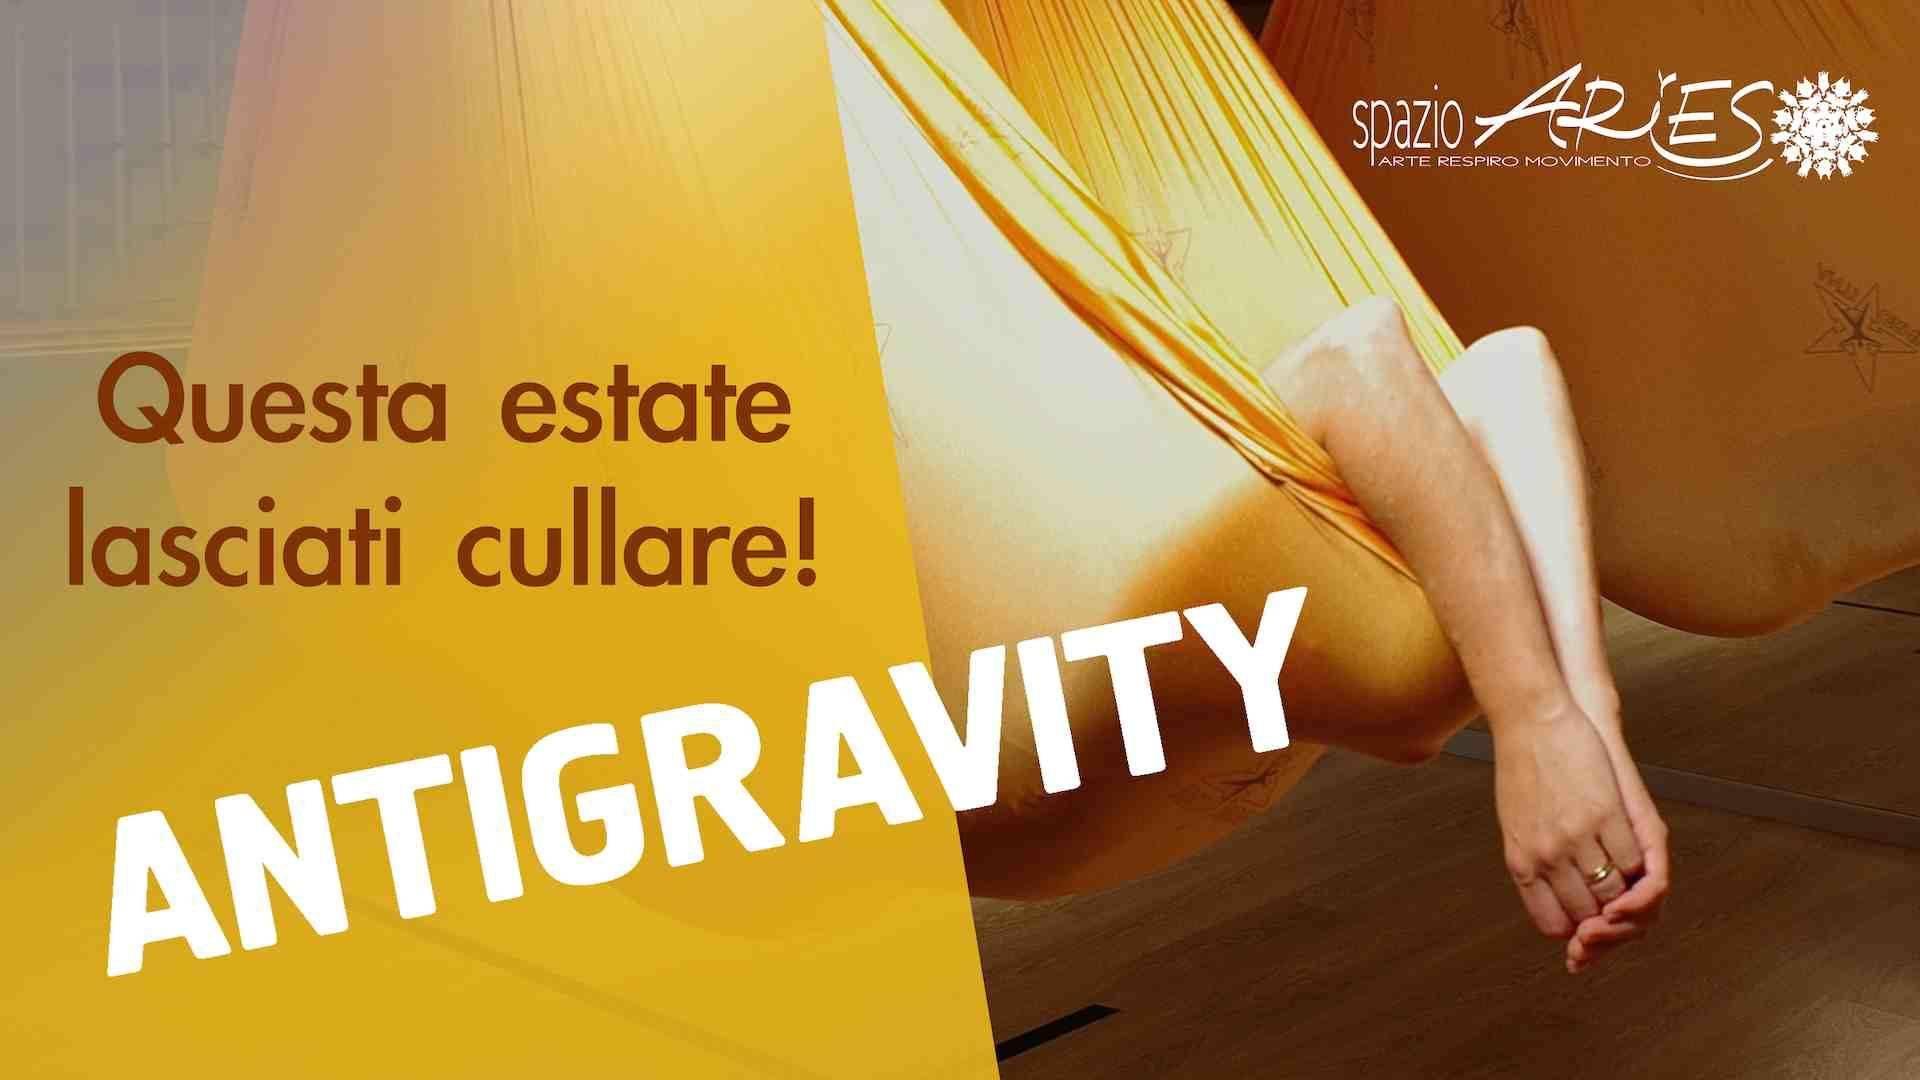 Antigravity e Aerial Yoga ritornano in sala!